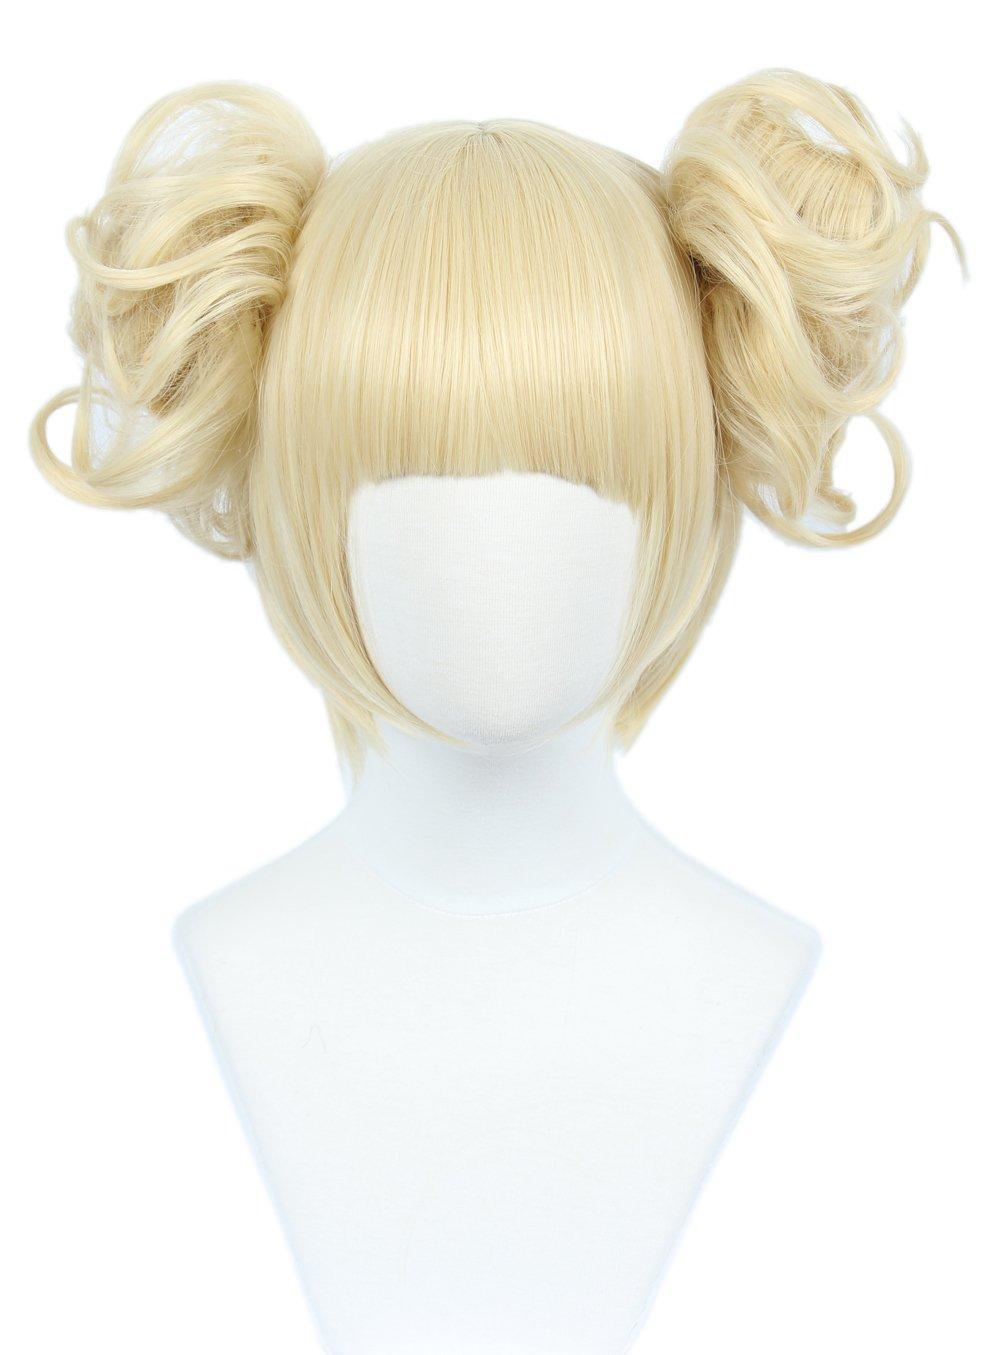 Linfairy Anime Cosplay Wig Short Halloween Costume Hero Wig (blonde bun)